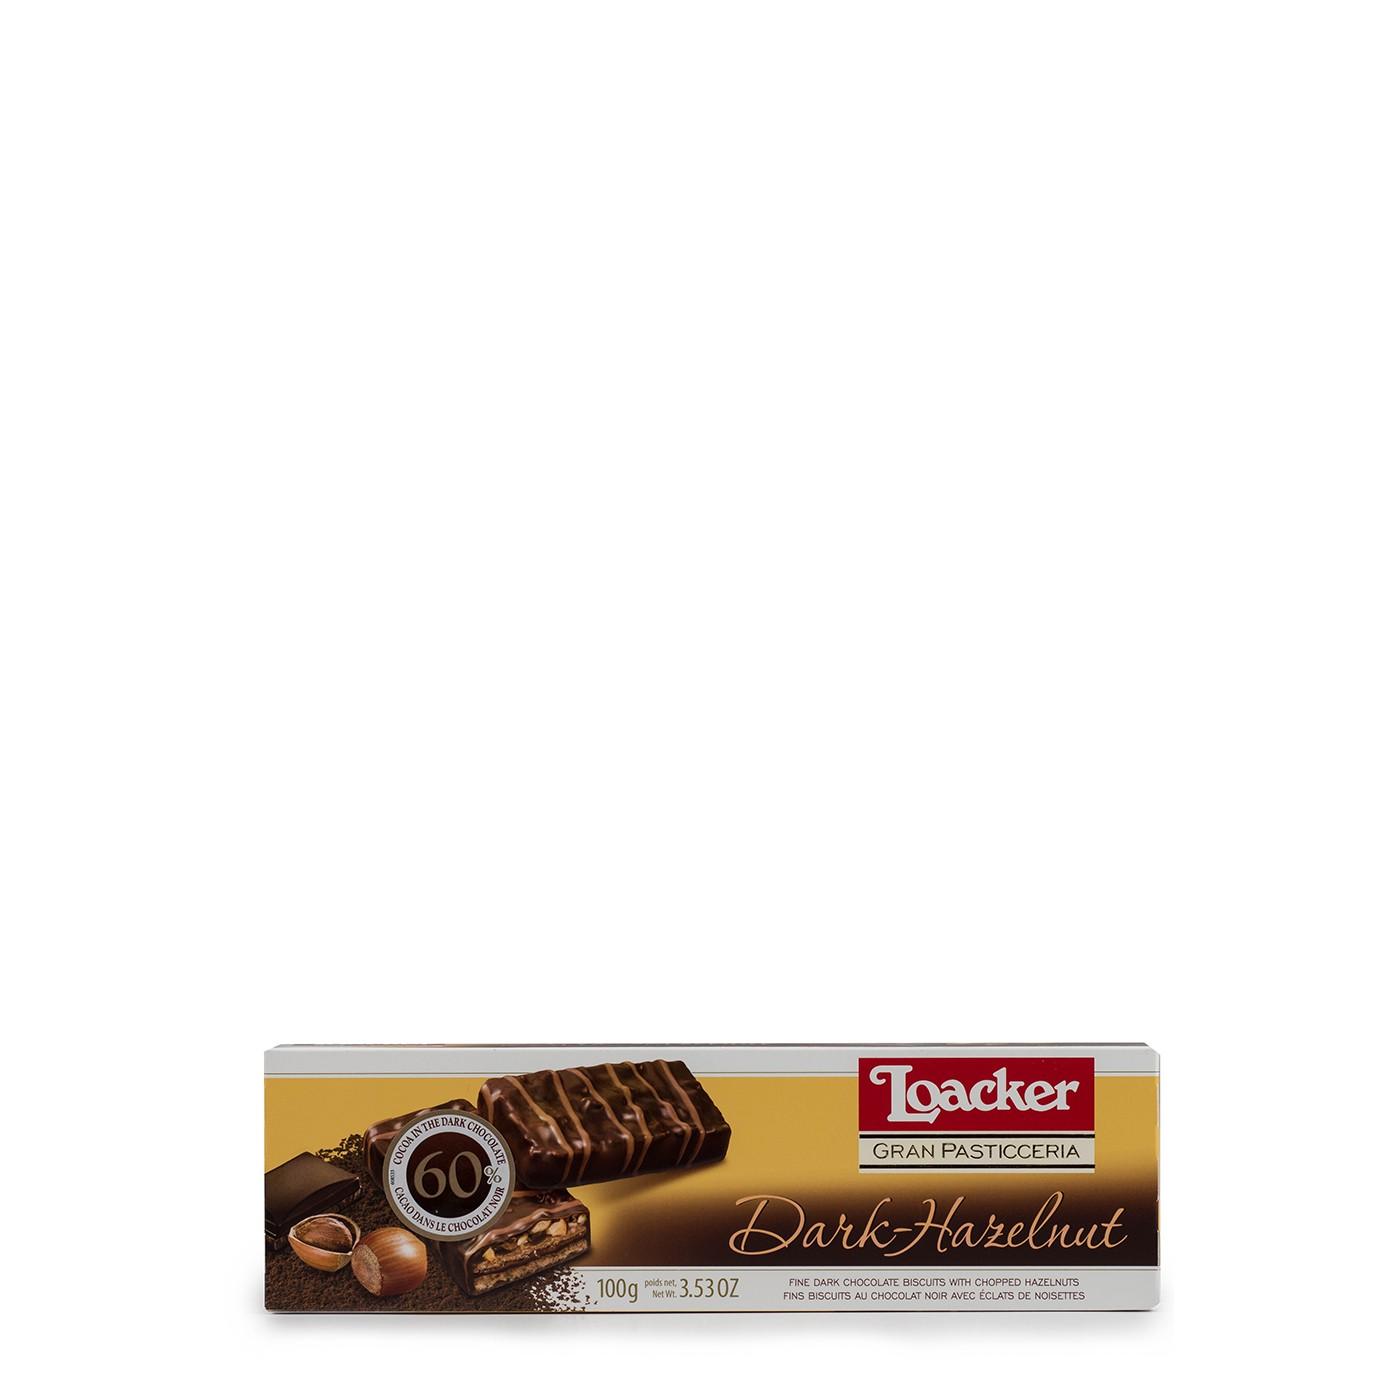 Gran Pasticceria: Dark-Chocolate Hazelnut 3.5 oz